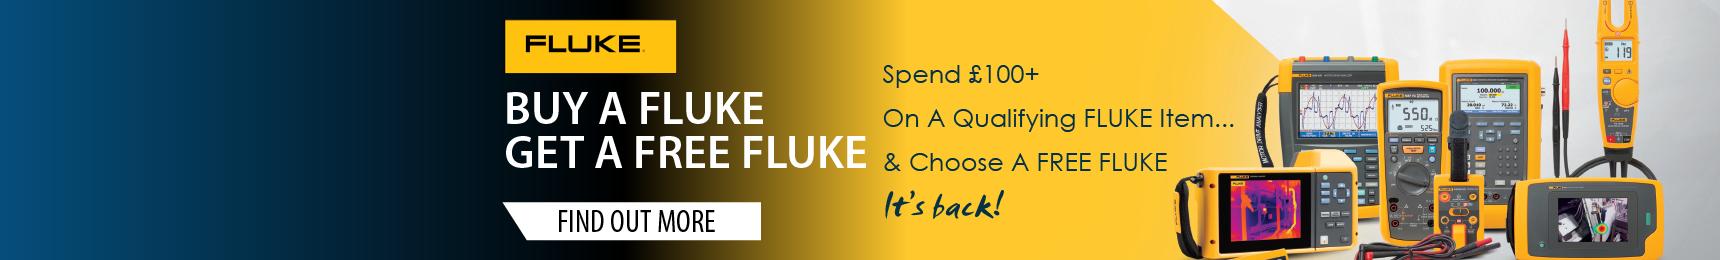 Buy A FLUKE, Get A FREE FLUKE PROMO (BAFGAFF)